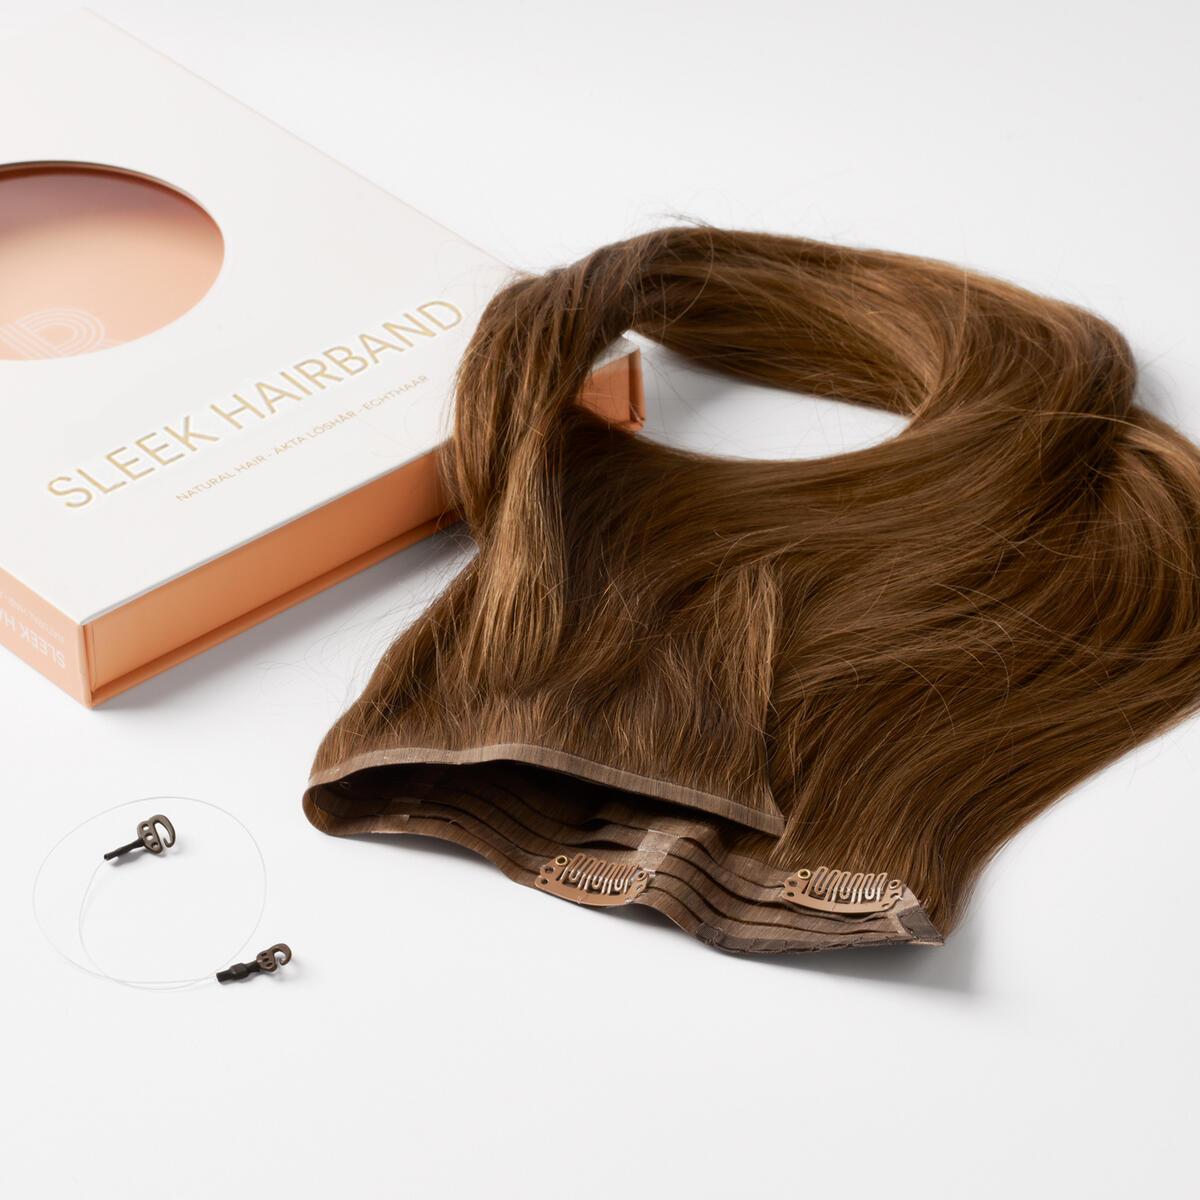 Sleek Hairband 5.0 Brown 50 cm